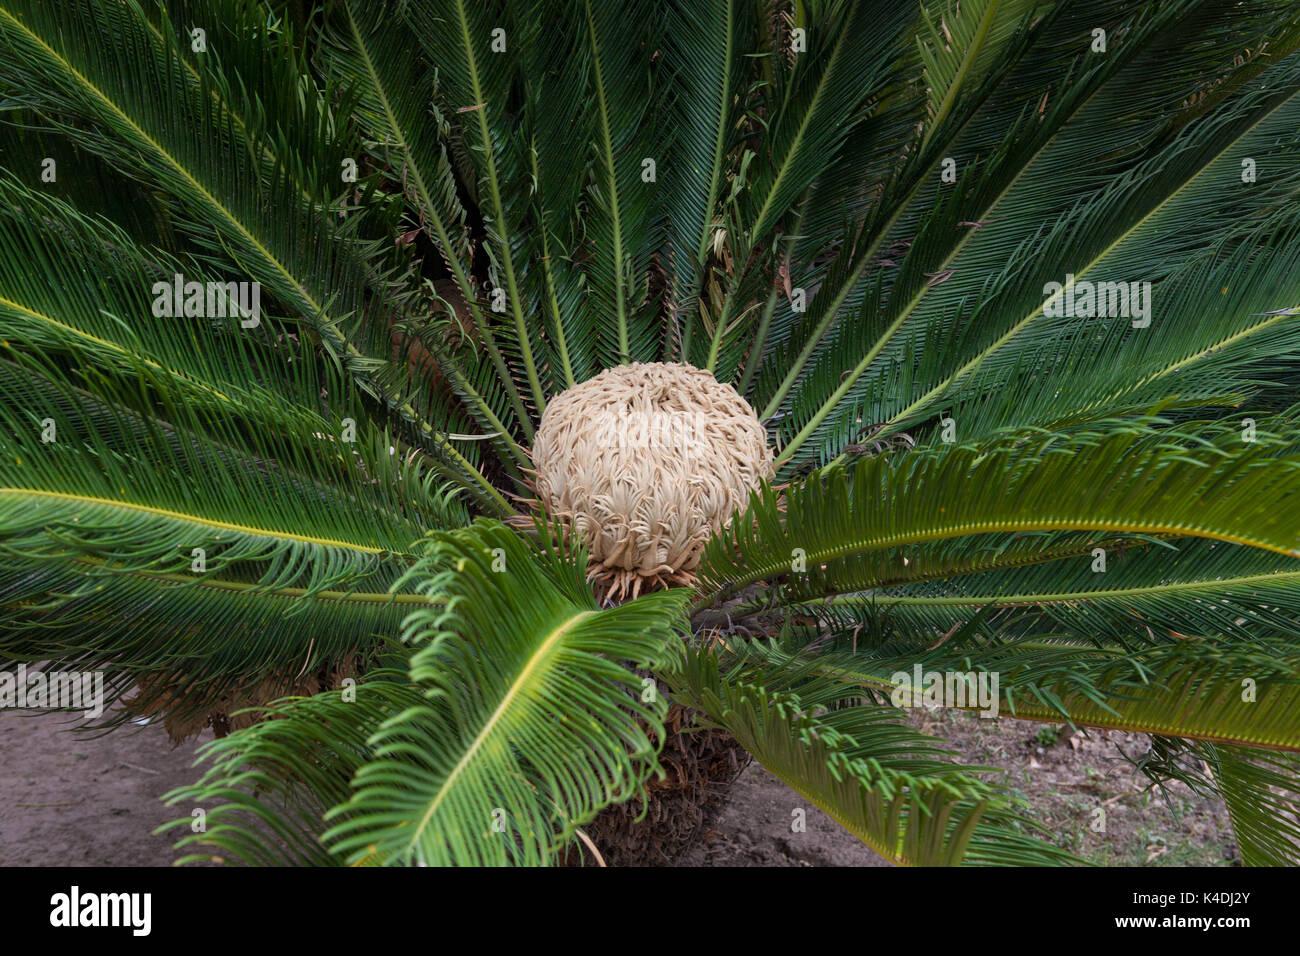 Giardini Pinjor (Yadavindra gardens), costruito per l'Harem del righello. Blooming Cycas revoluta Sago Palm nel giardino. Pinjor, Haryana, India Immagini Stock